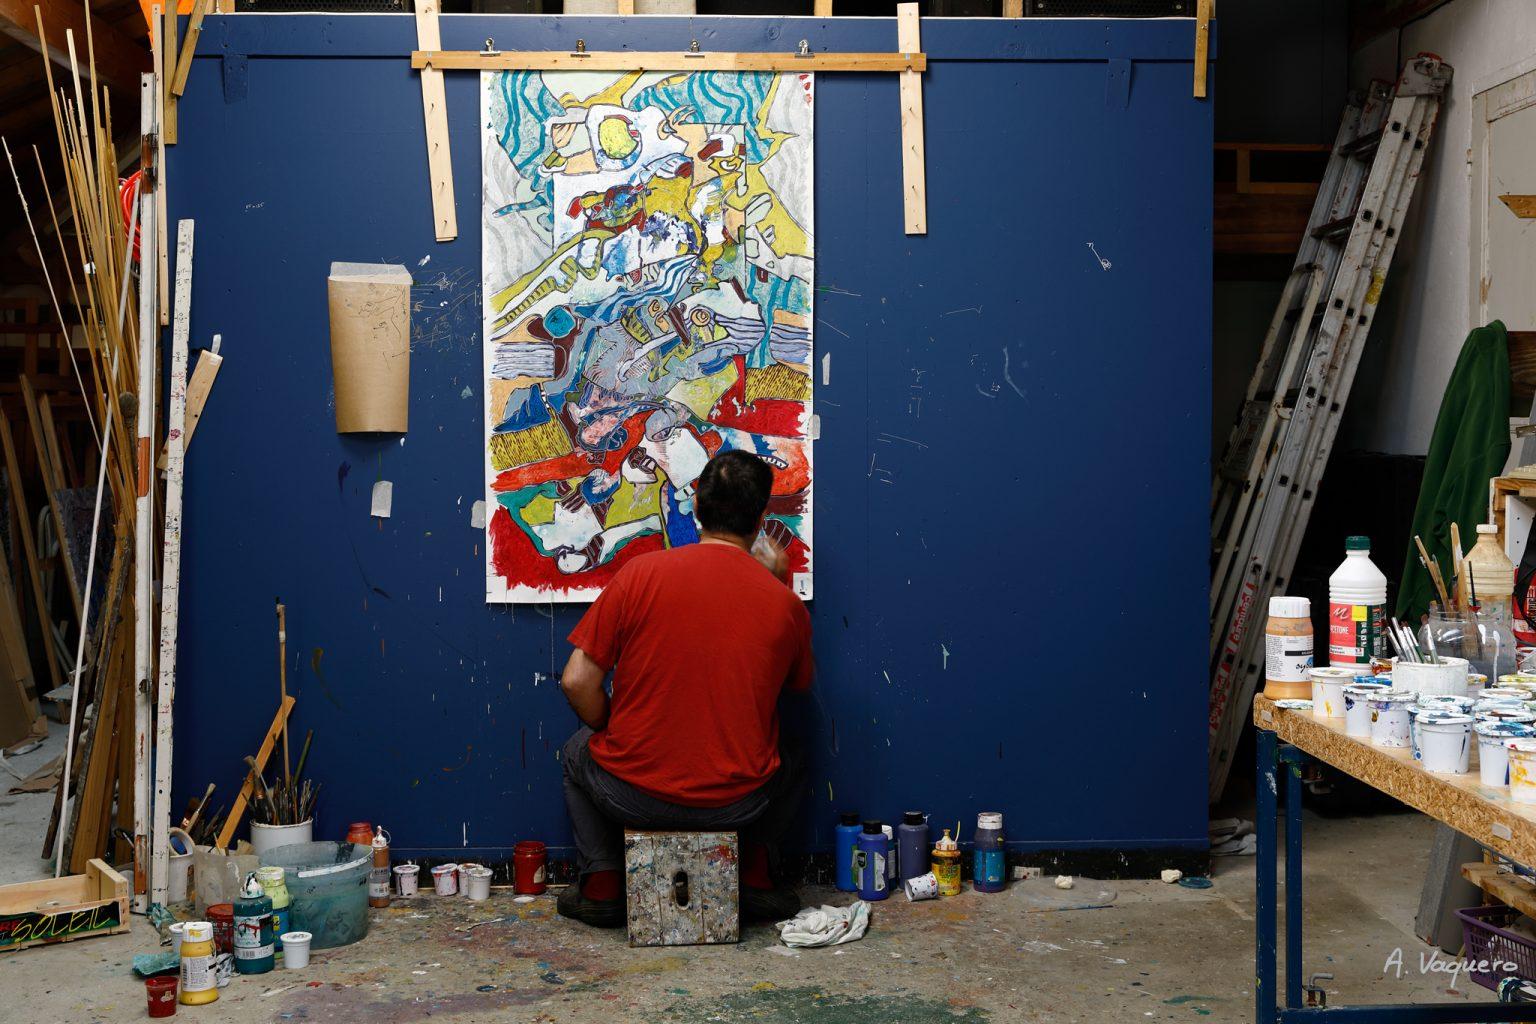 L'artiste Franck CAVADORE dans son atelier de Tarnos 2 © Alexandra VAQUERO